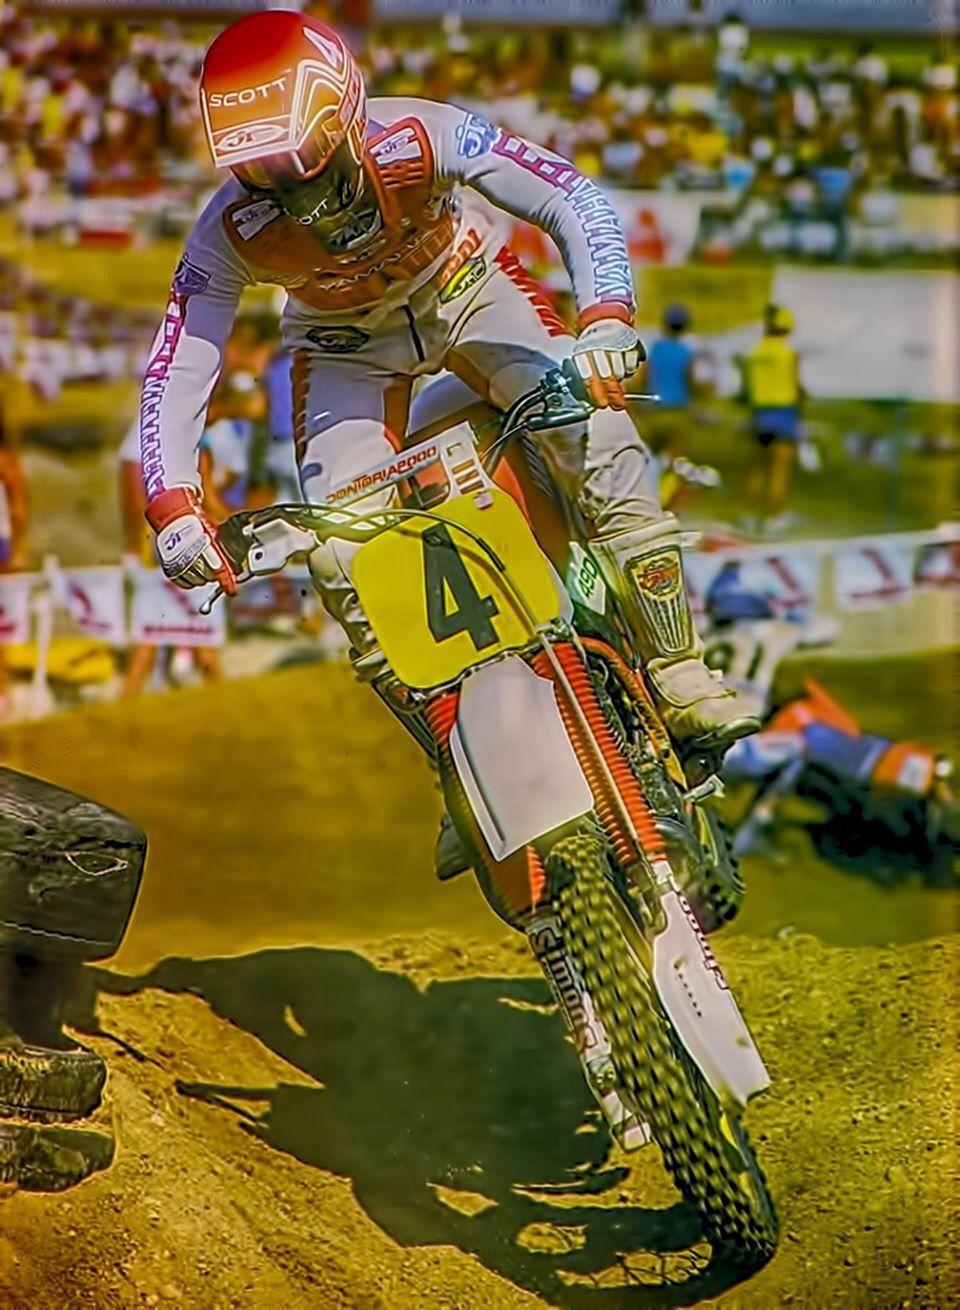 Broc Glover # motocross us